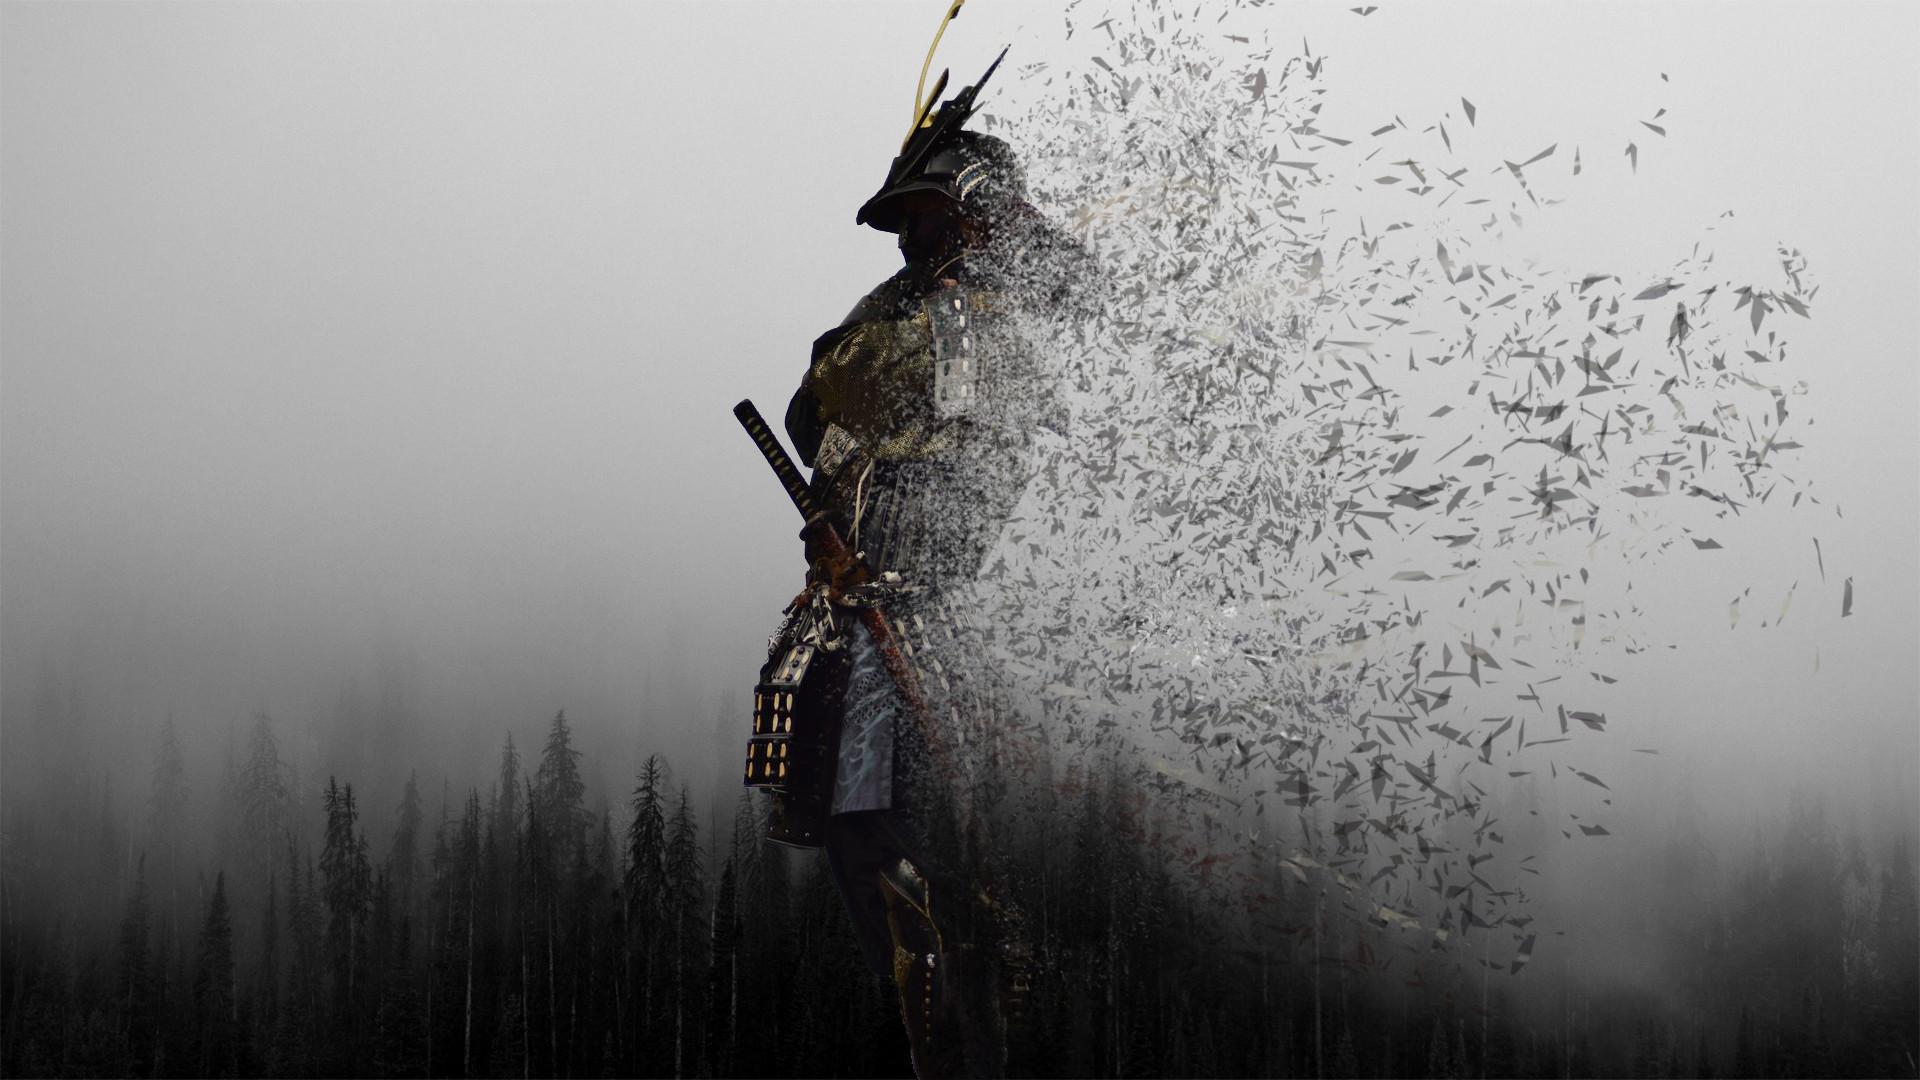 обои на пк самураи которых